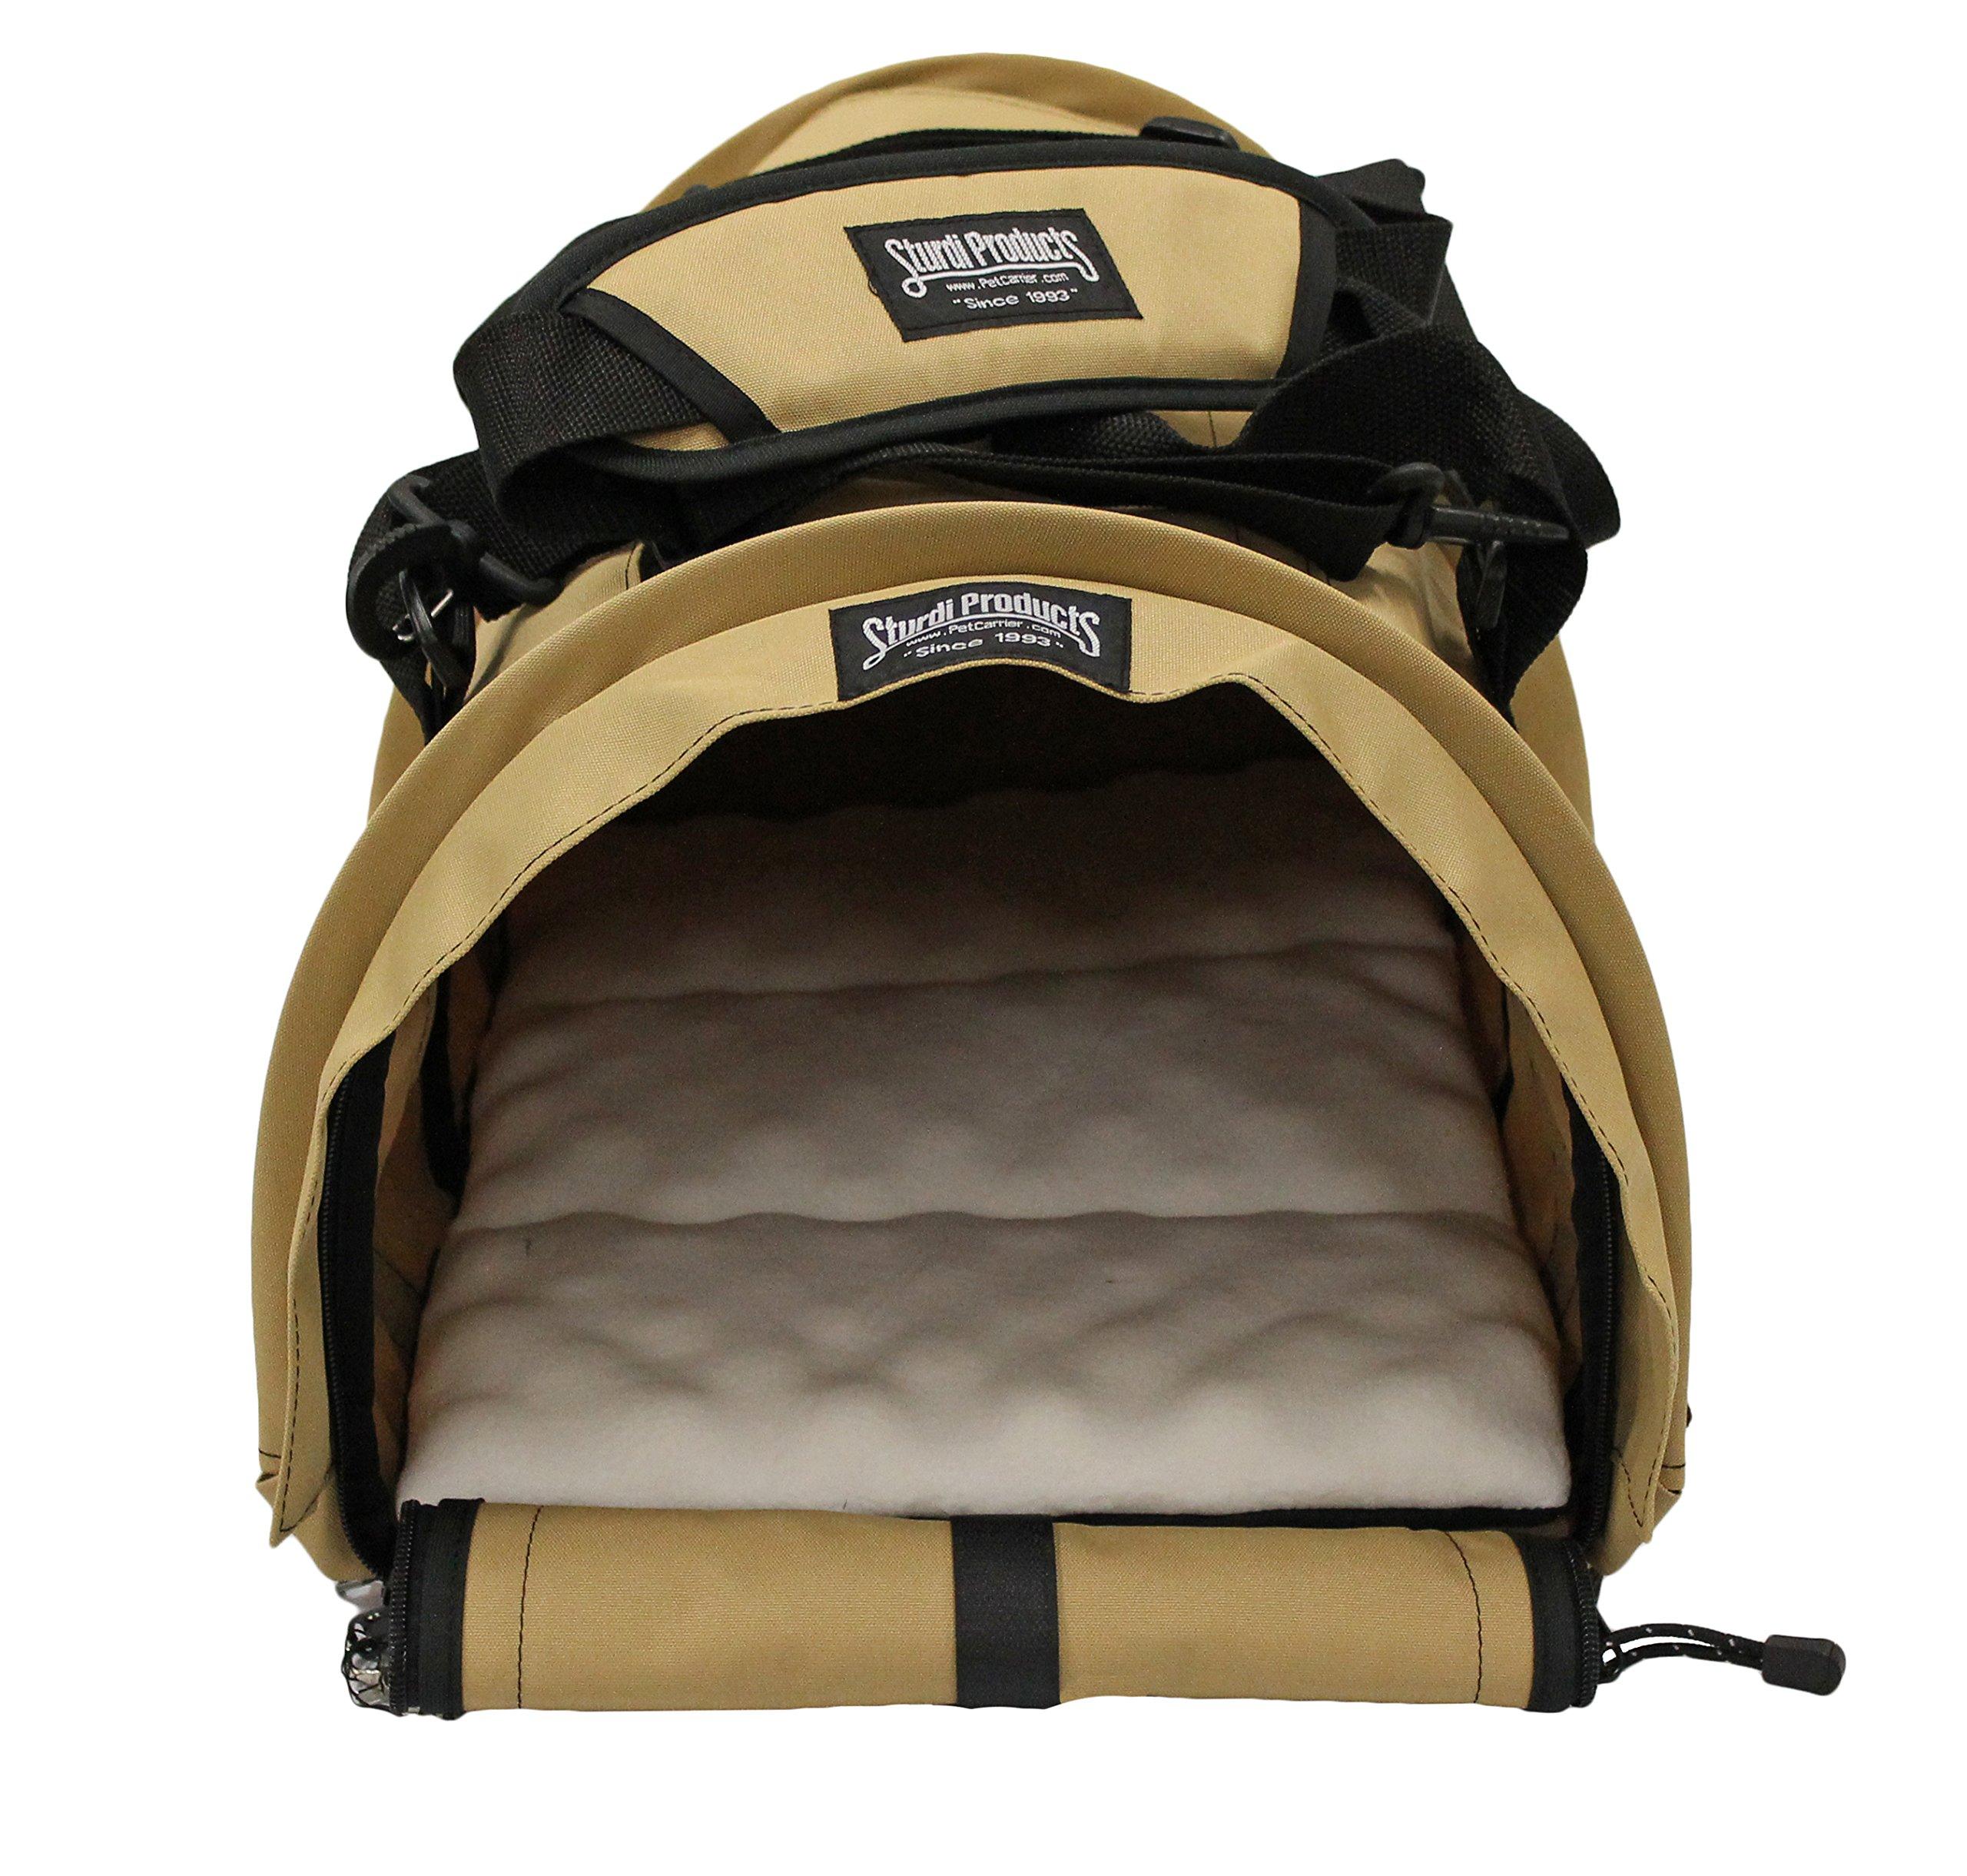 Sturdi Products SturdiBag Large Pet Carrier, Earthy Tan